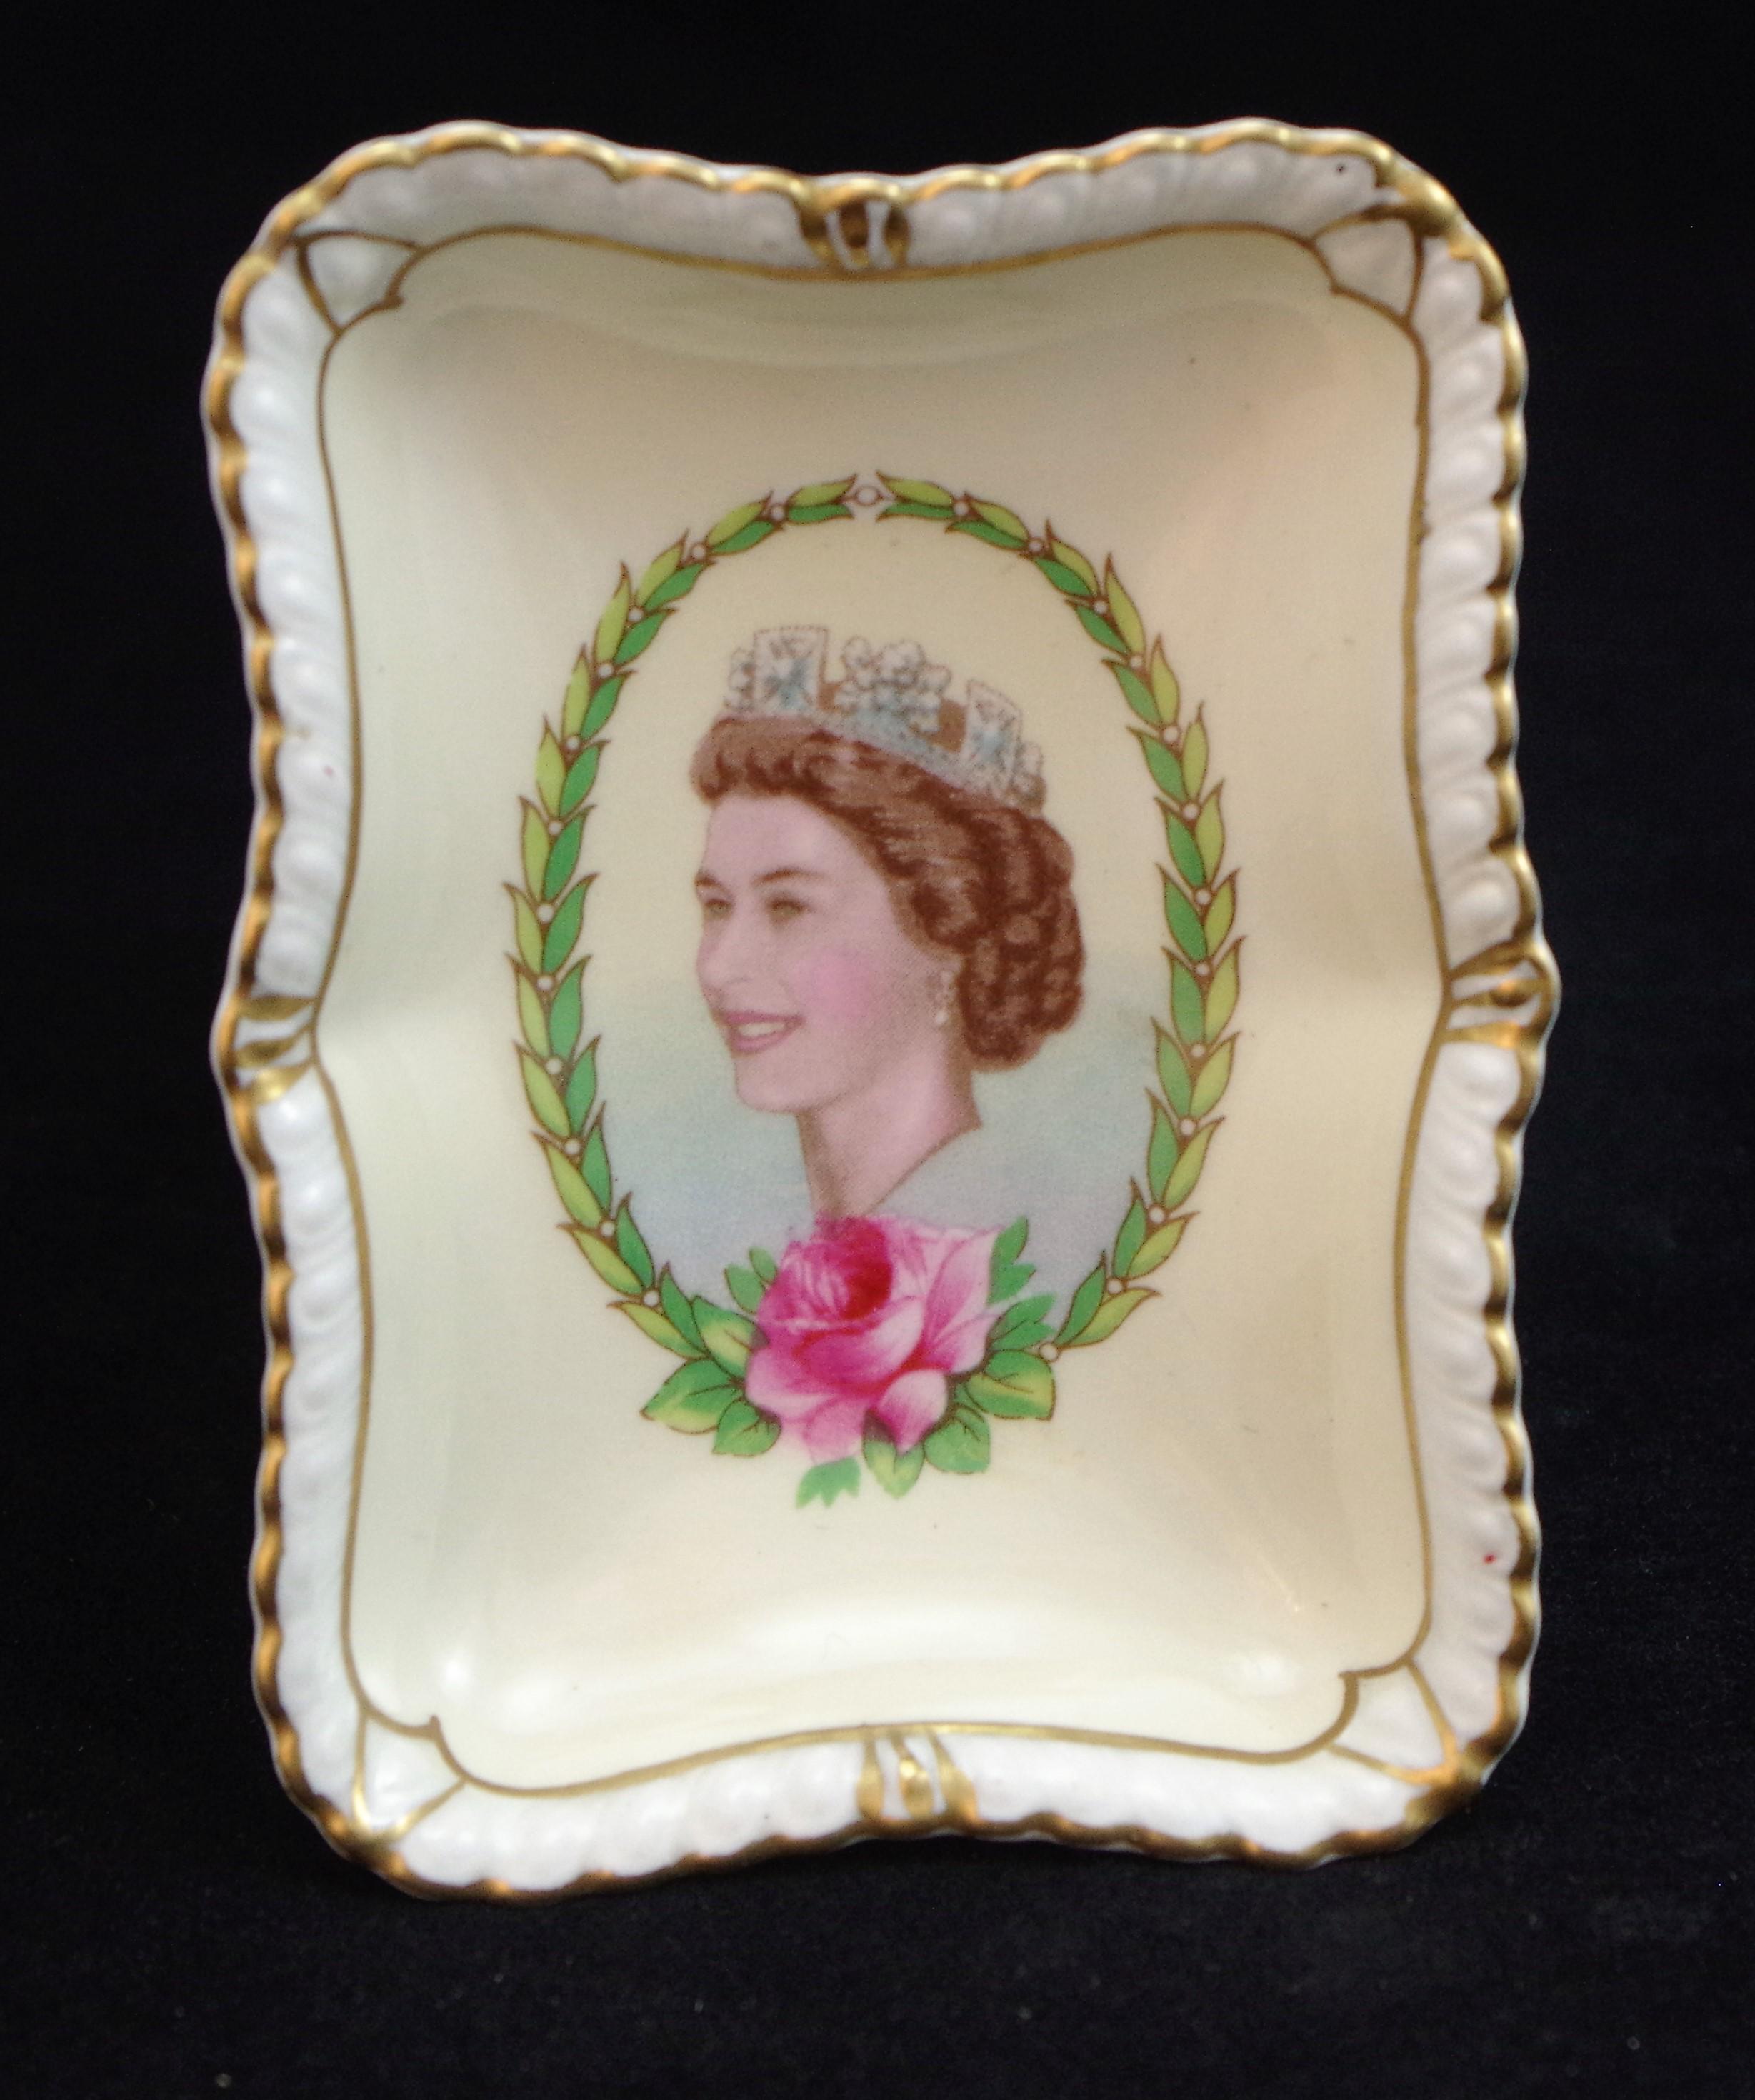 royal-crown-derby-gadroon-elizabeth-II-coronation-tray 1953